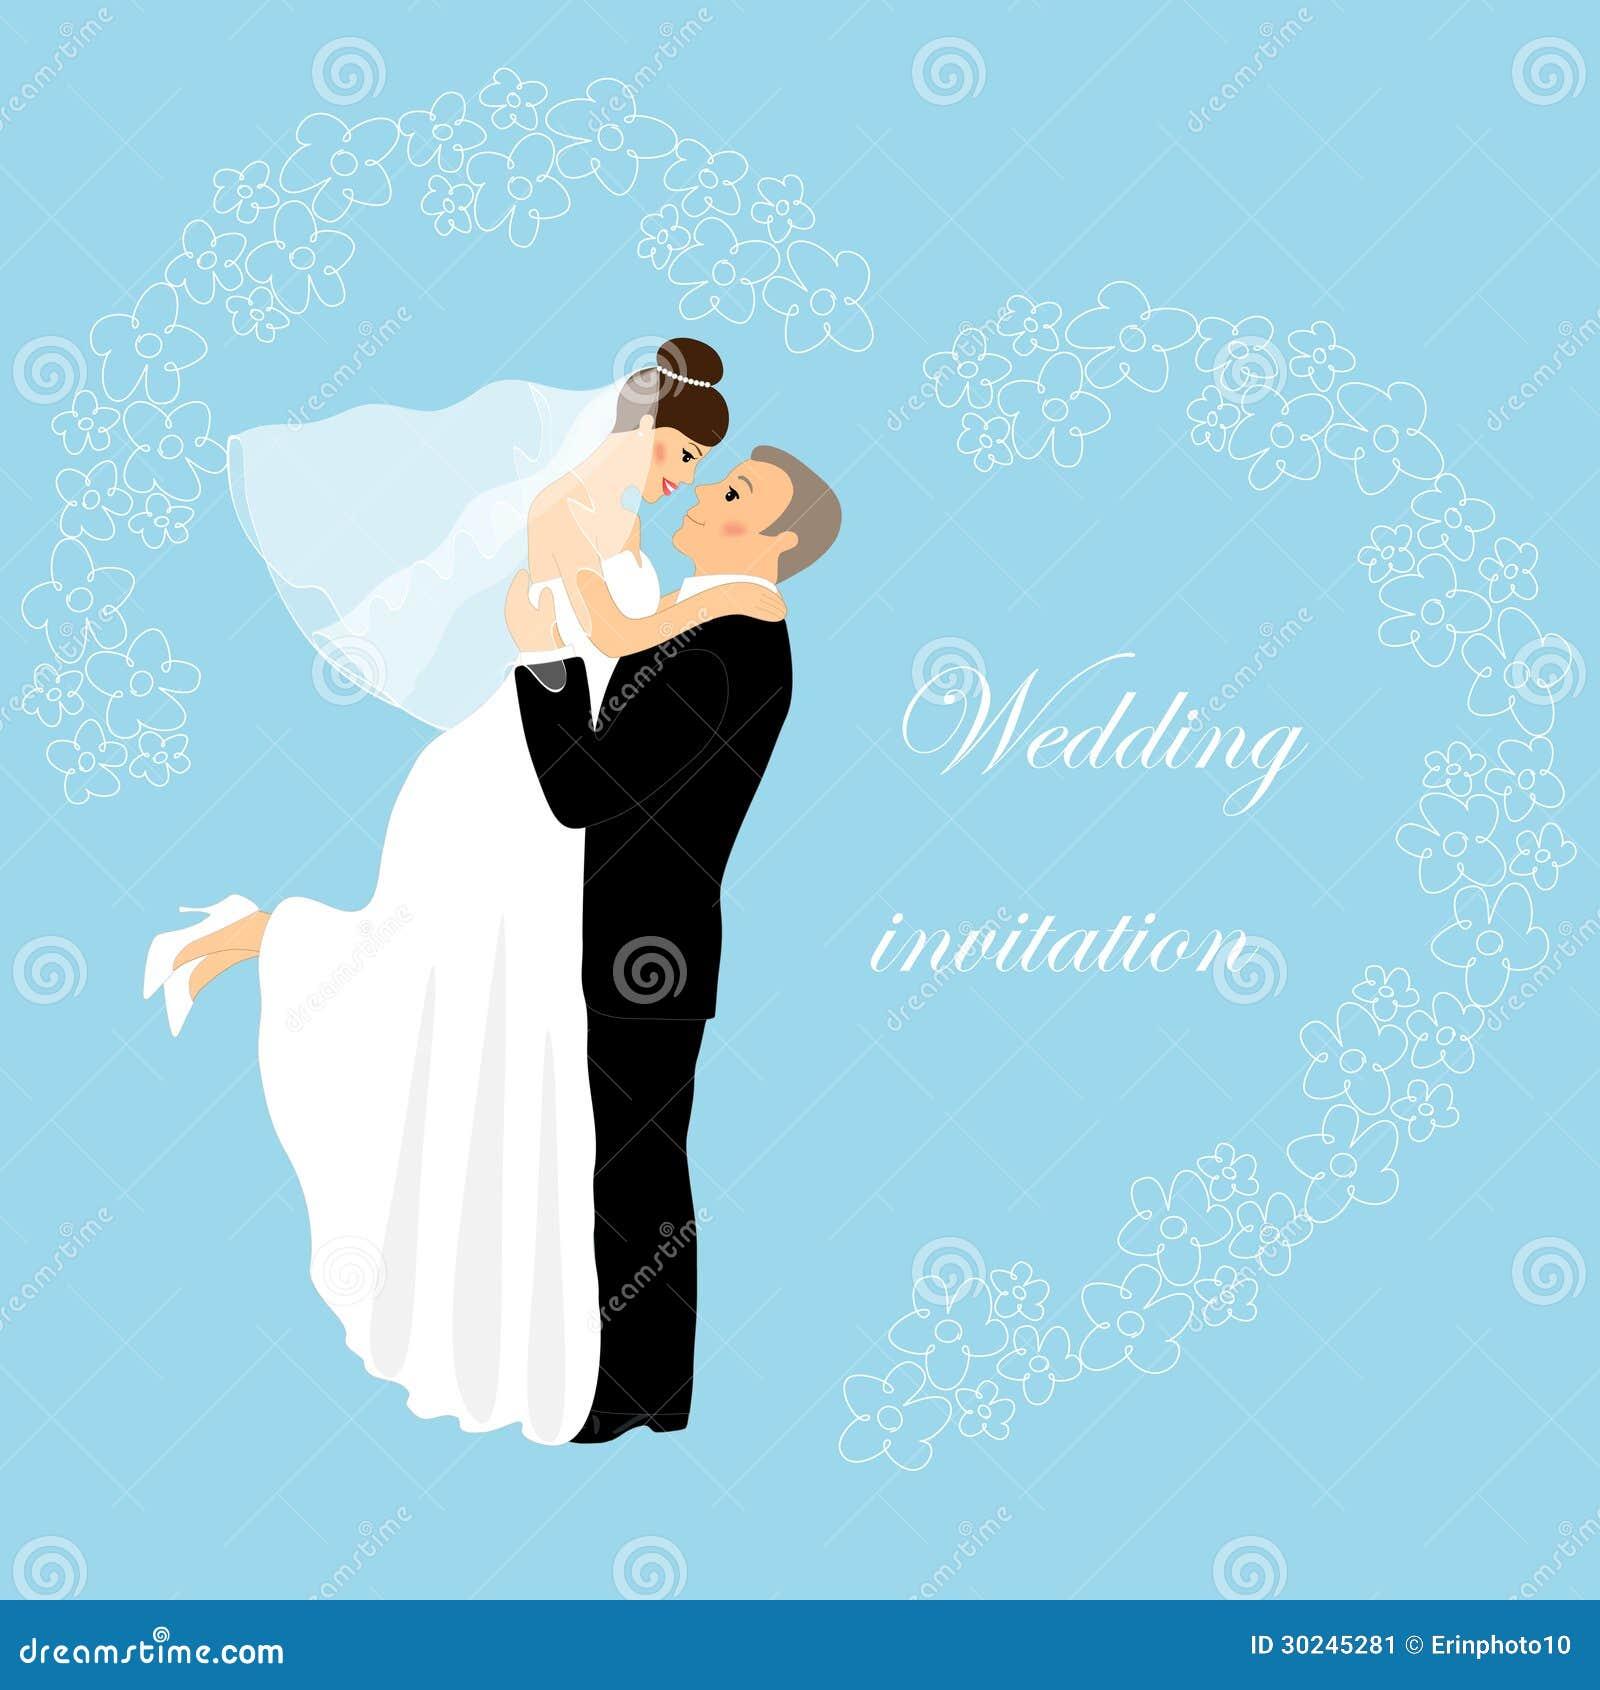 Wedding Invitation 12 Stock Illustration Illustration Of Ceremony 30245281